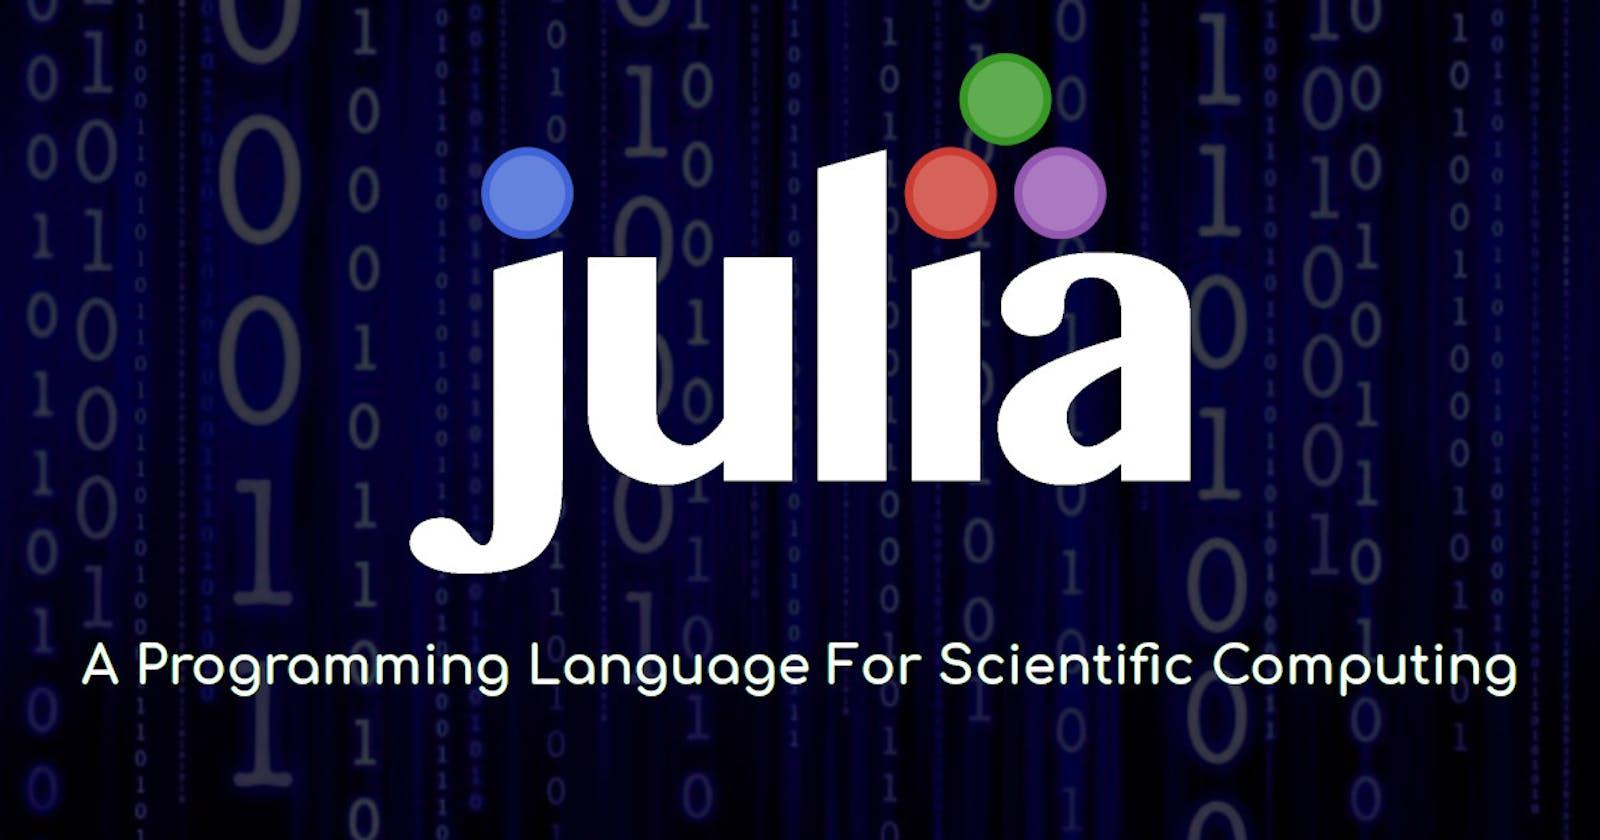 My First Impression of Julia